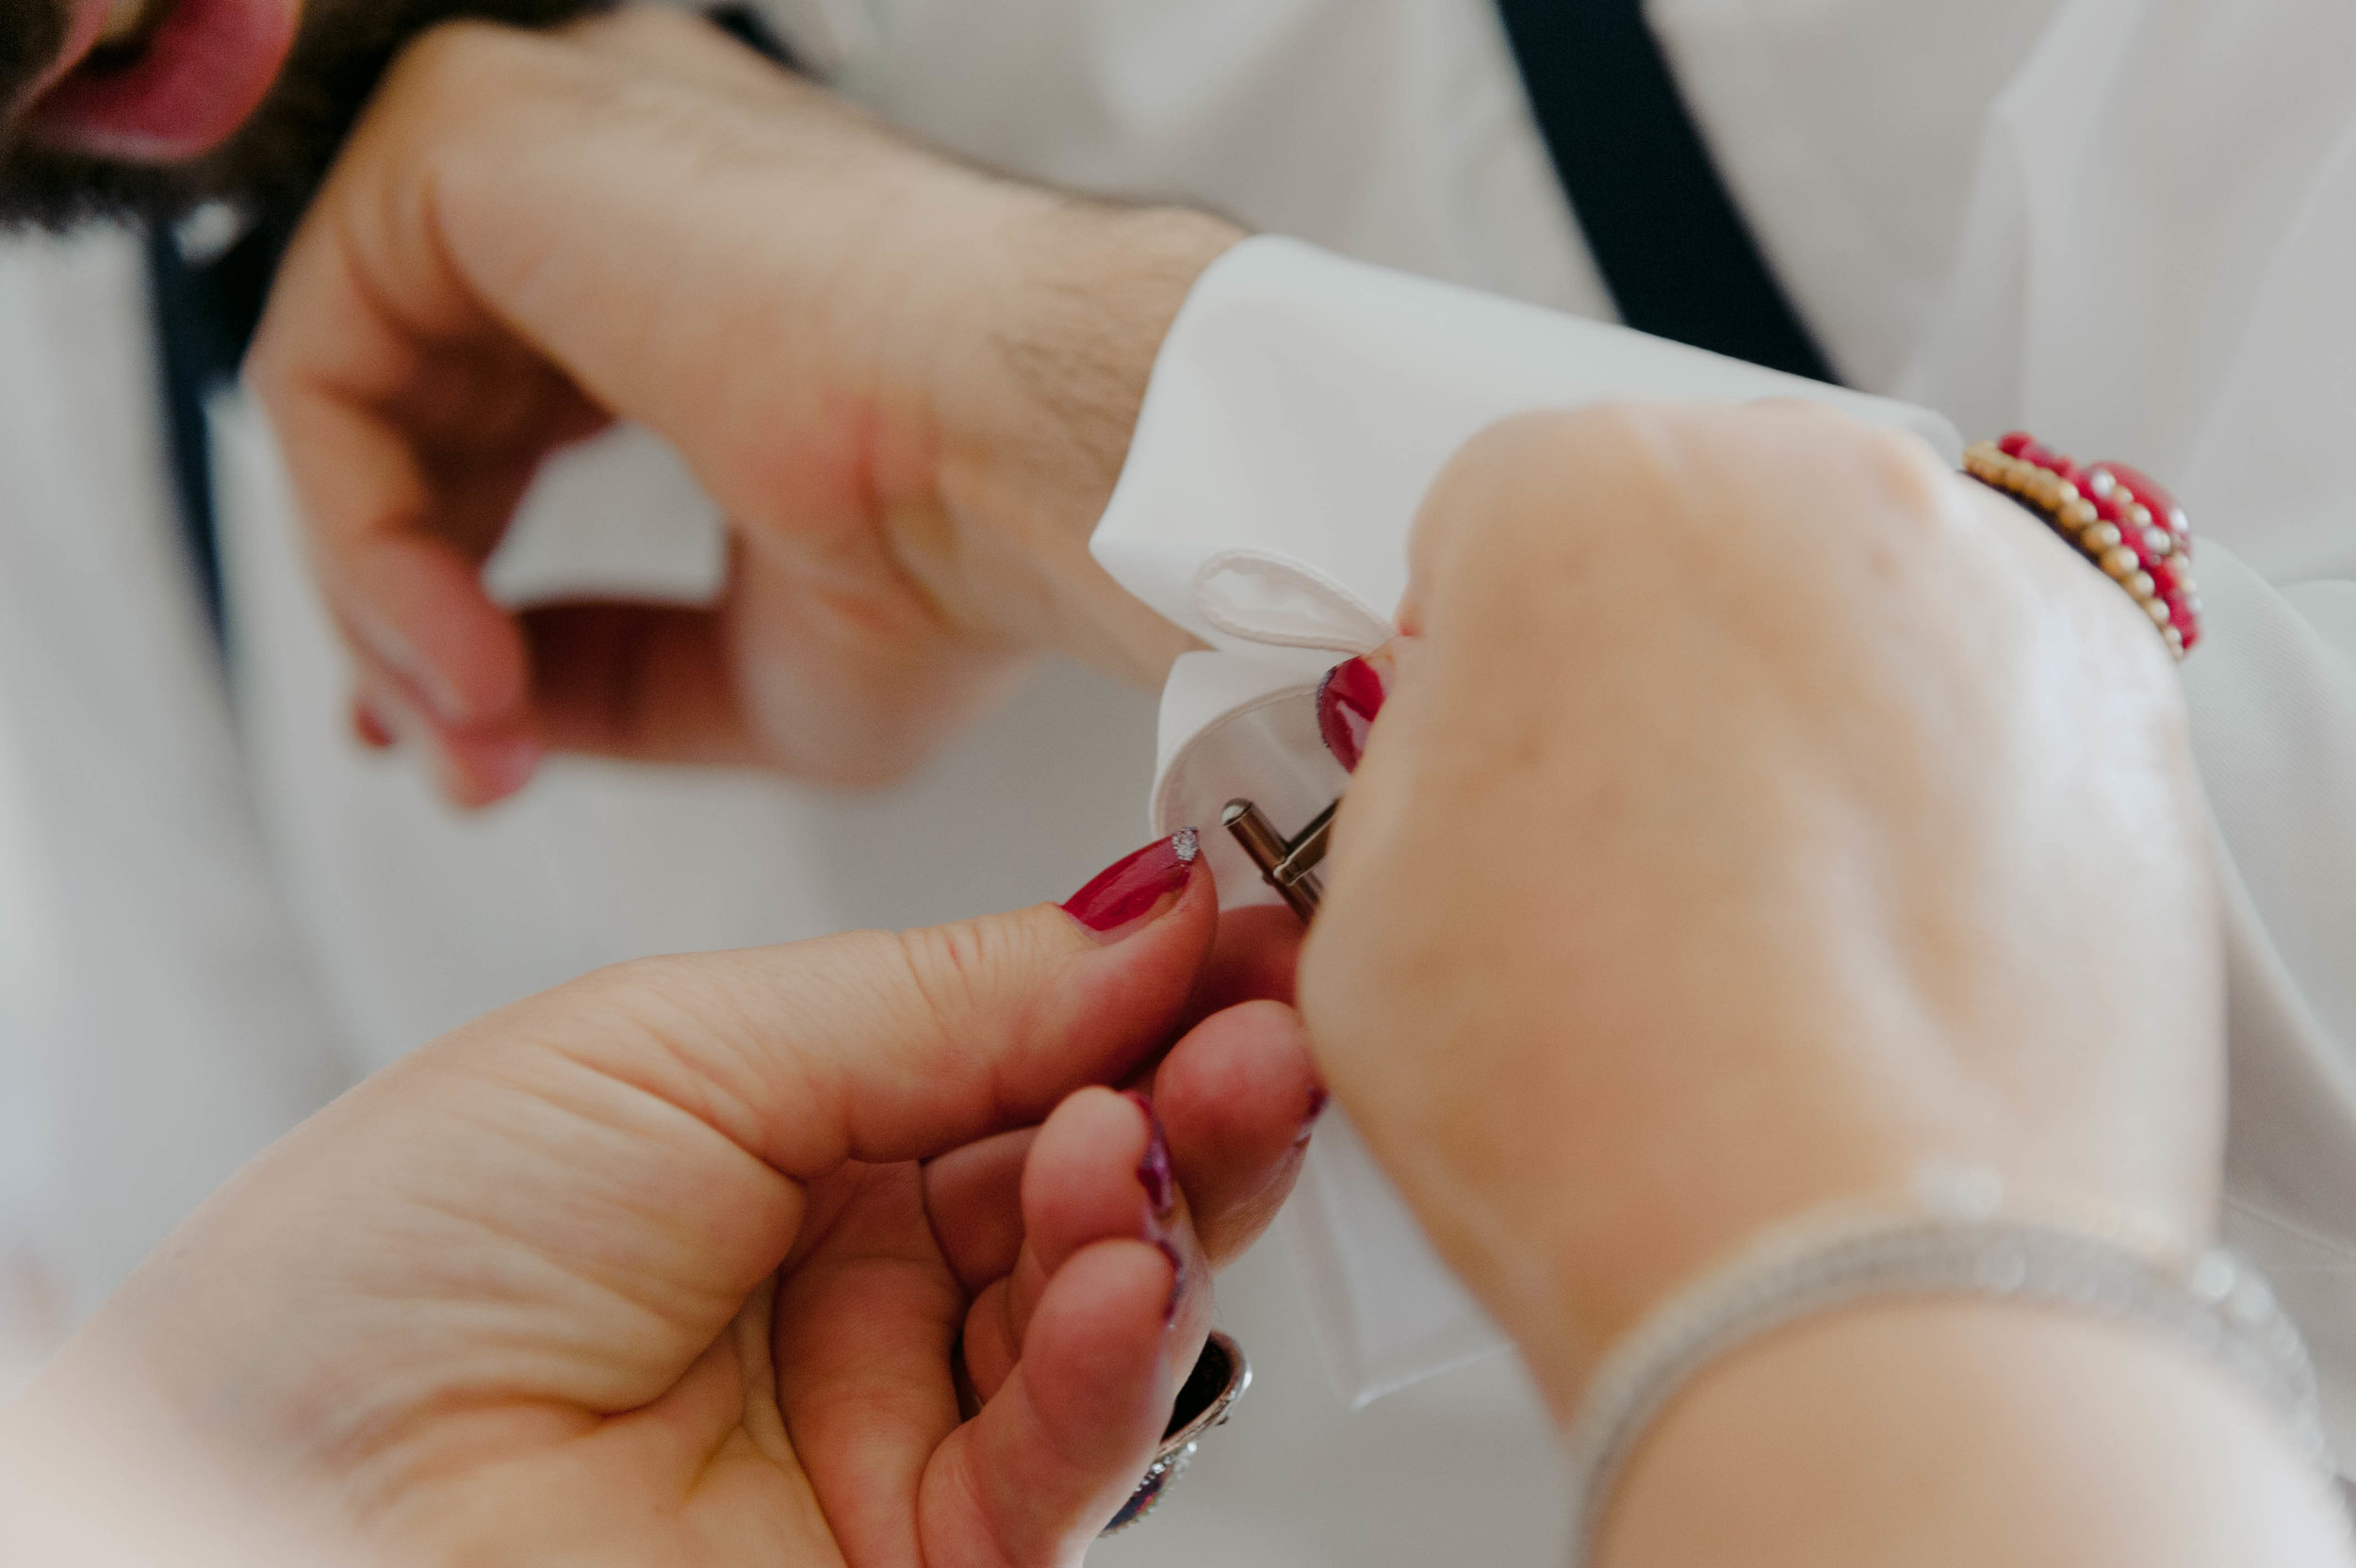 076 - Preparazione sposi.jpg